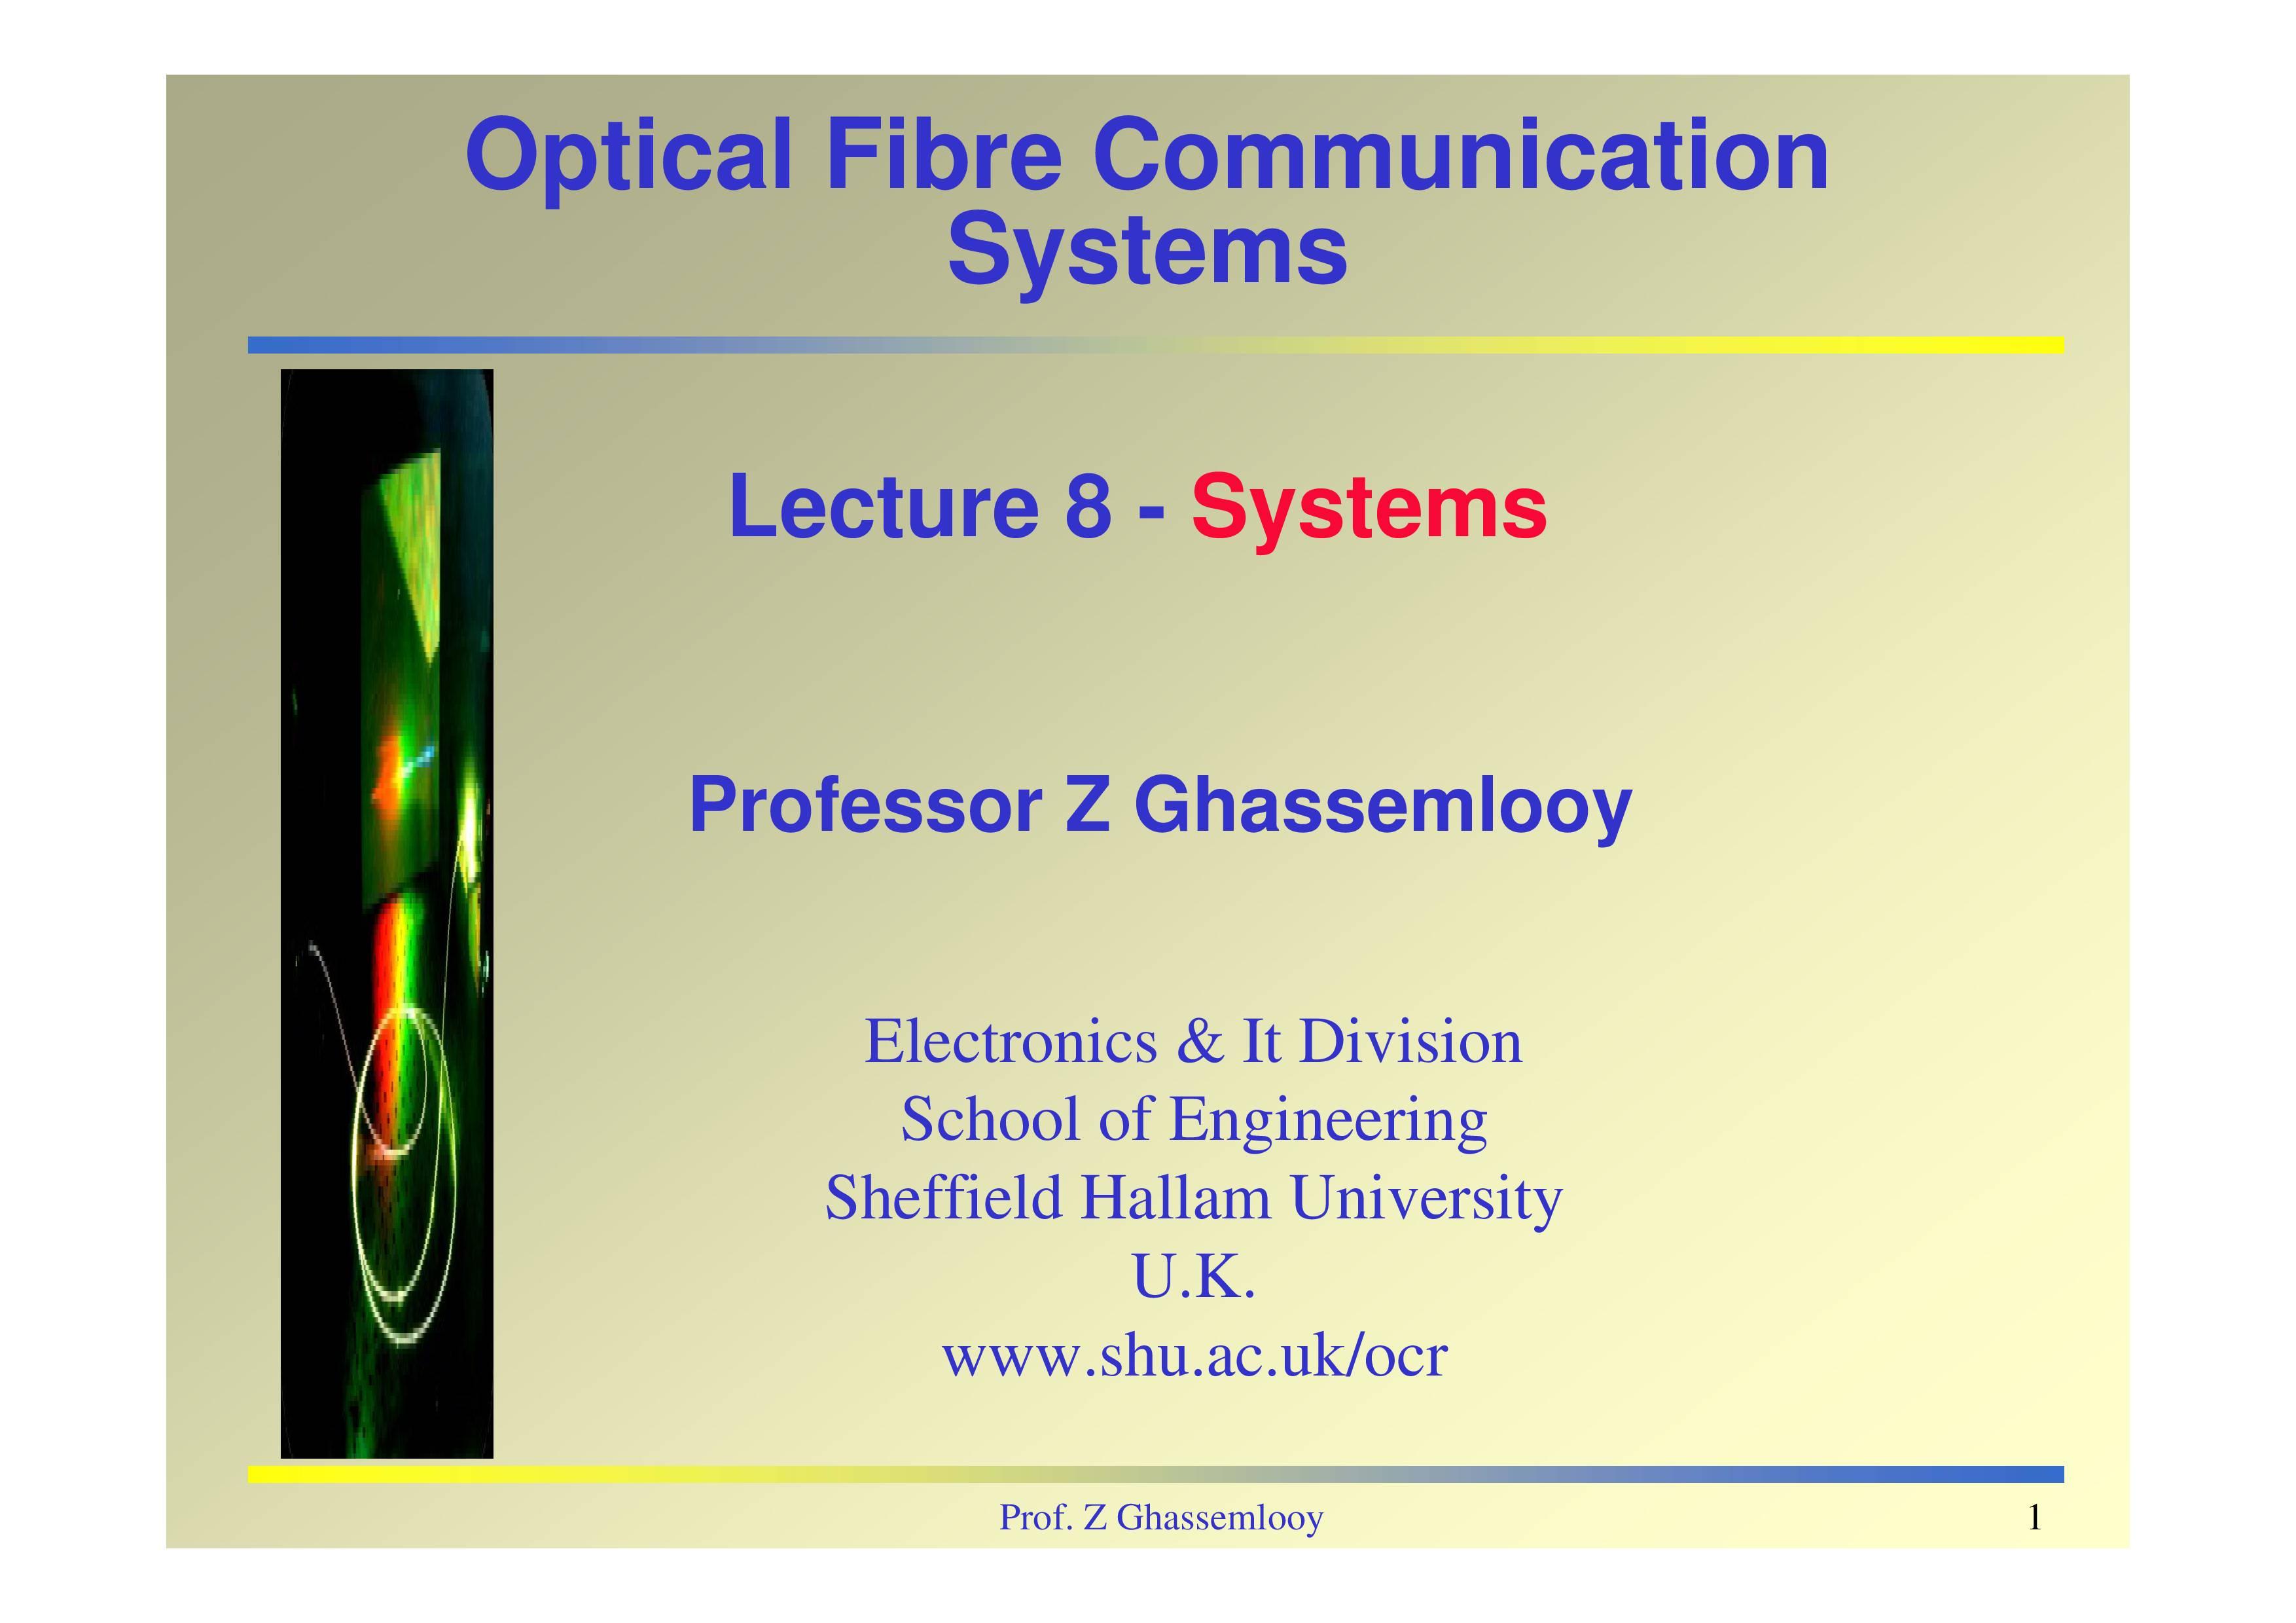 PPT On Optical Fiber Communication System